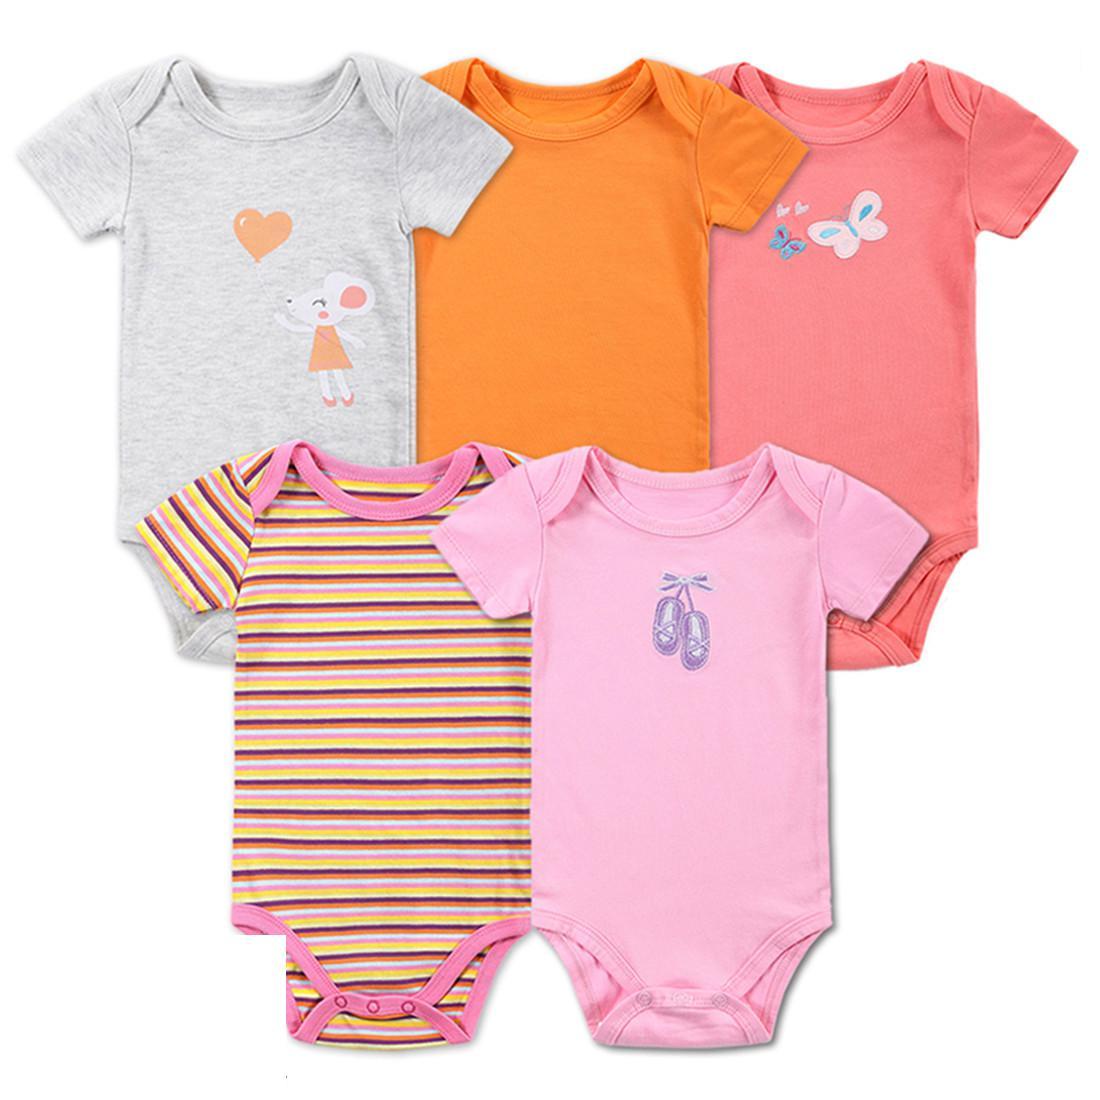 5pcs Kids Summer Clothes Designer Rompers For Kids First Impressions